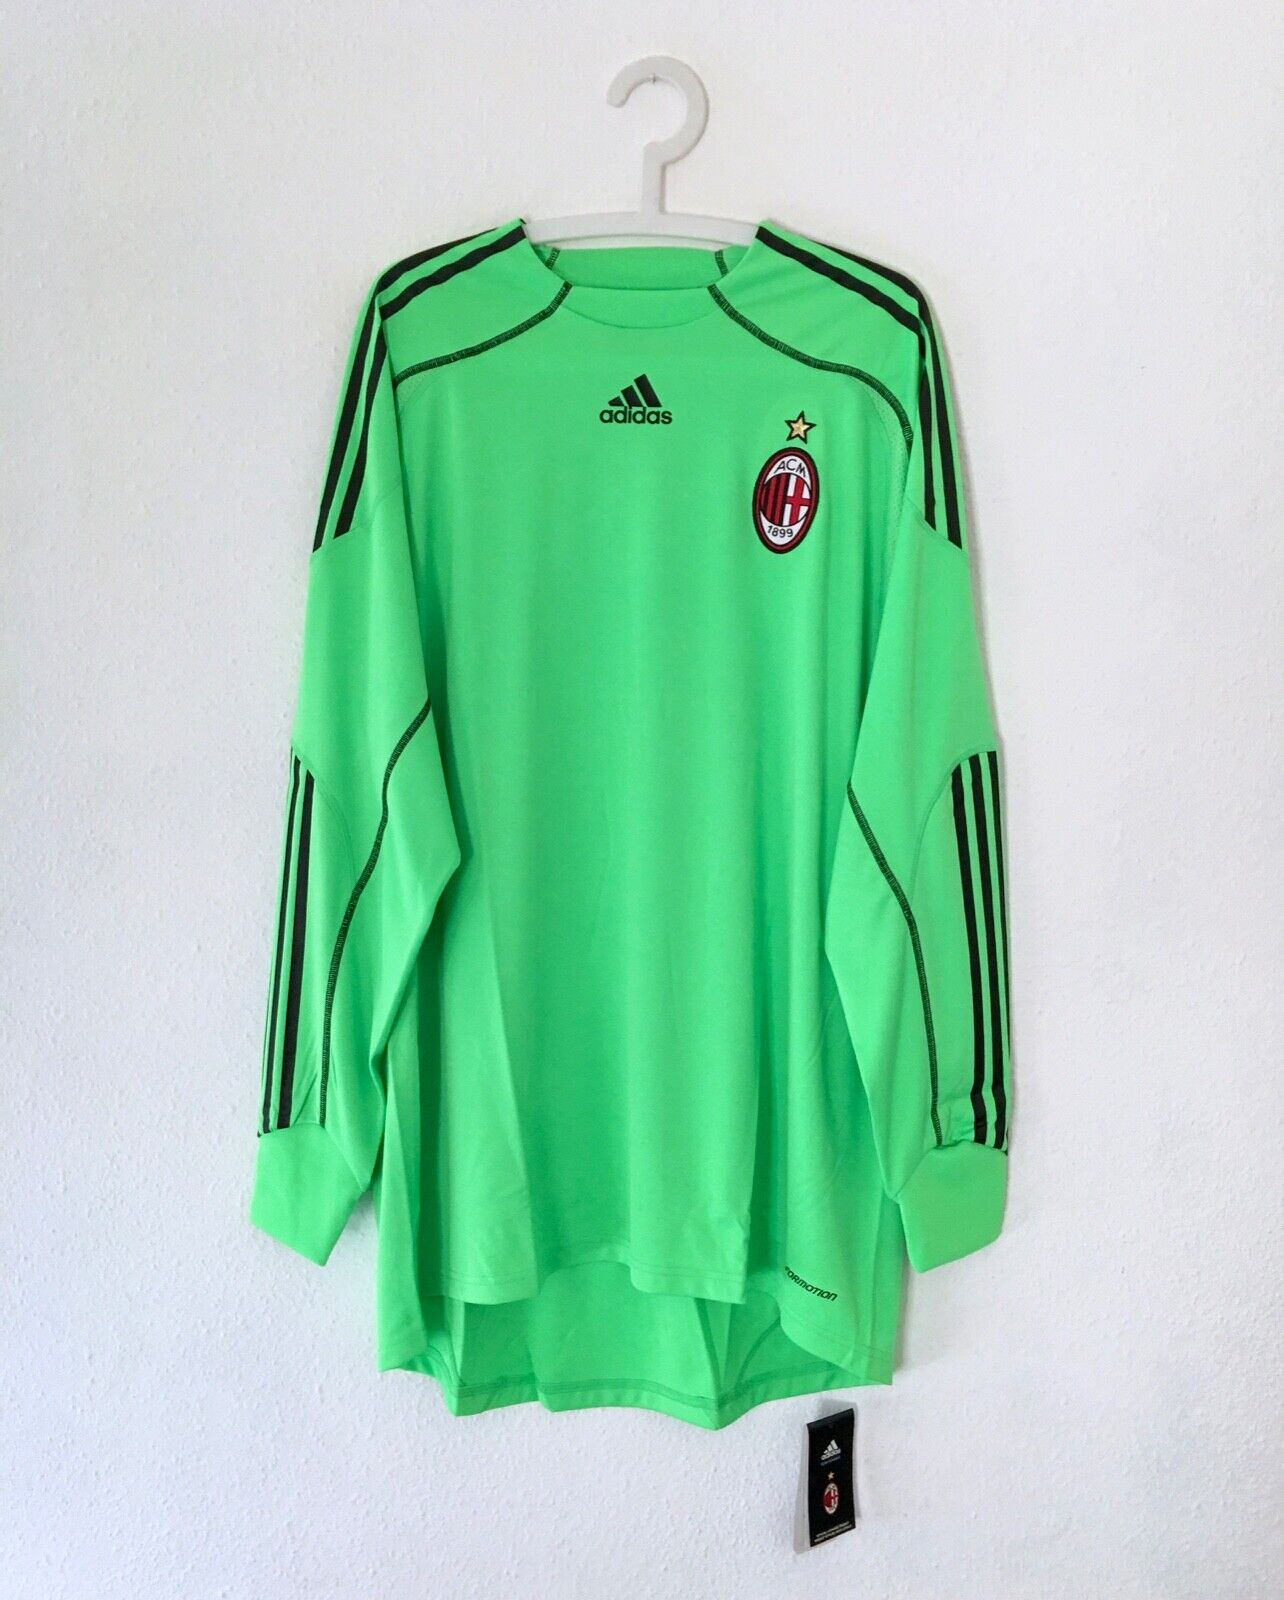 New AC MILAN 2009/10 Adidas Goalkeeper Football Shirt XL Vintage Soccer Jersey